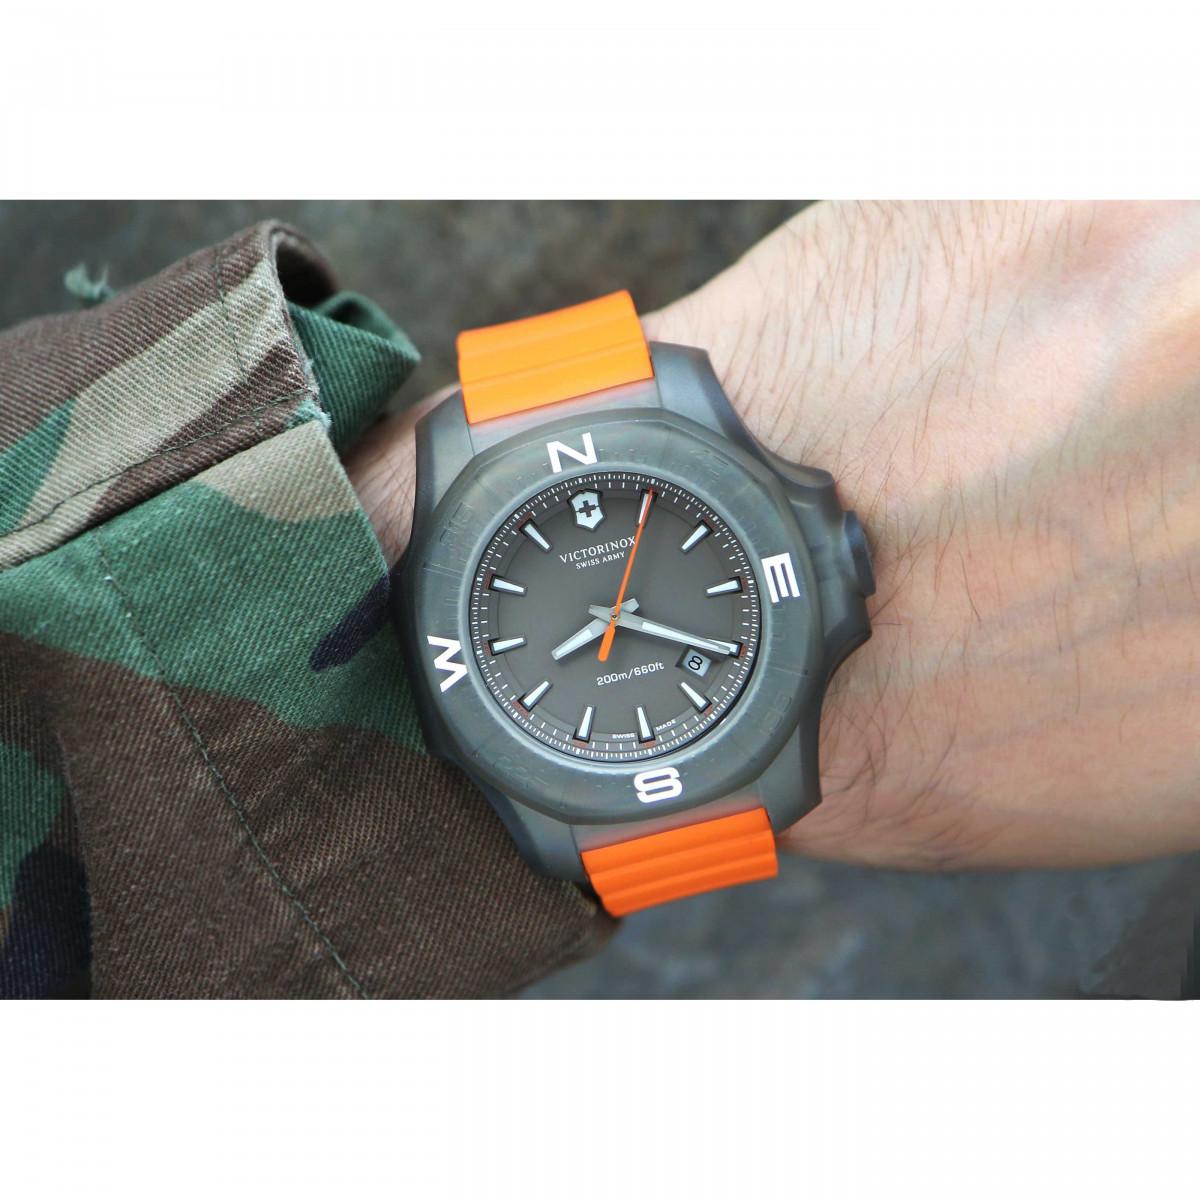 Montre Homme Victorinox I.N.O.X. Titane, boîtier titane, bracelet caoutchouc orange - 43 mm